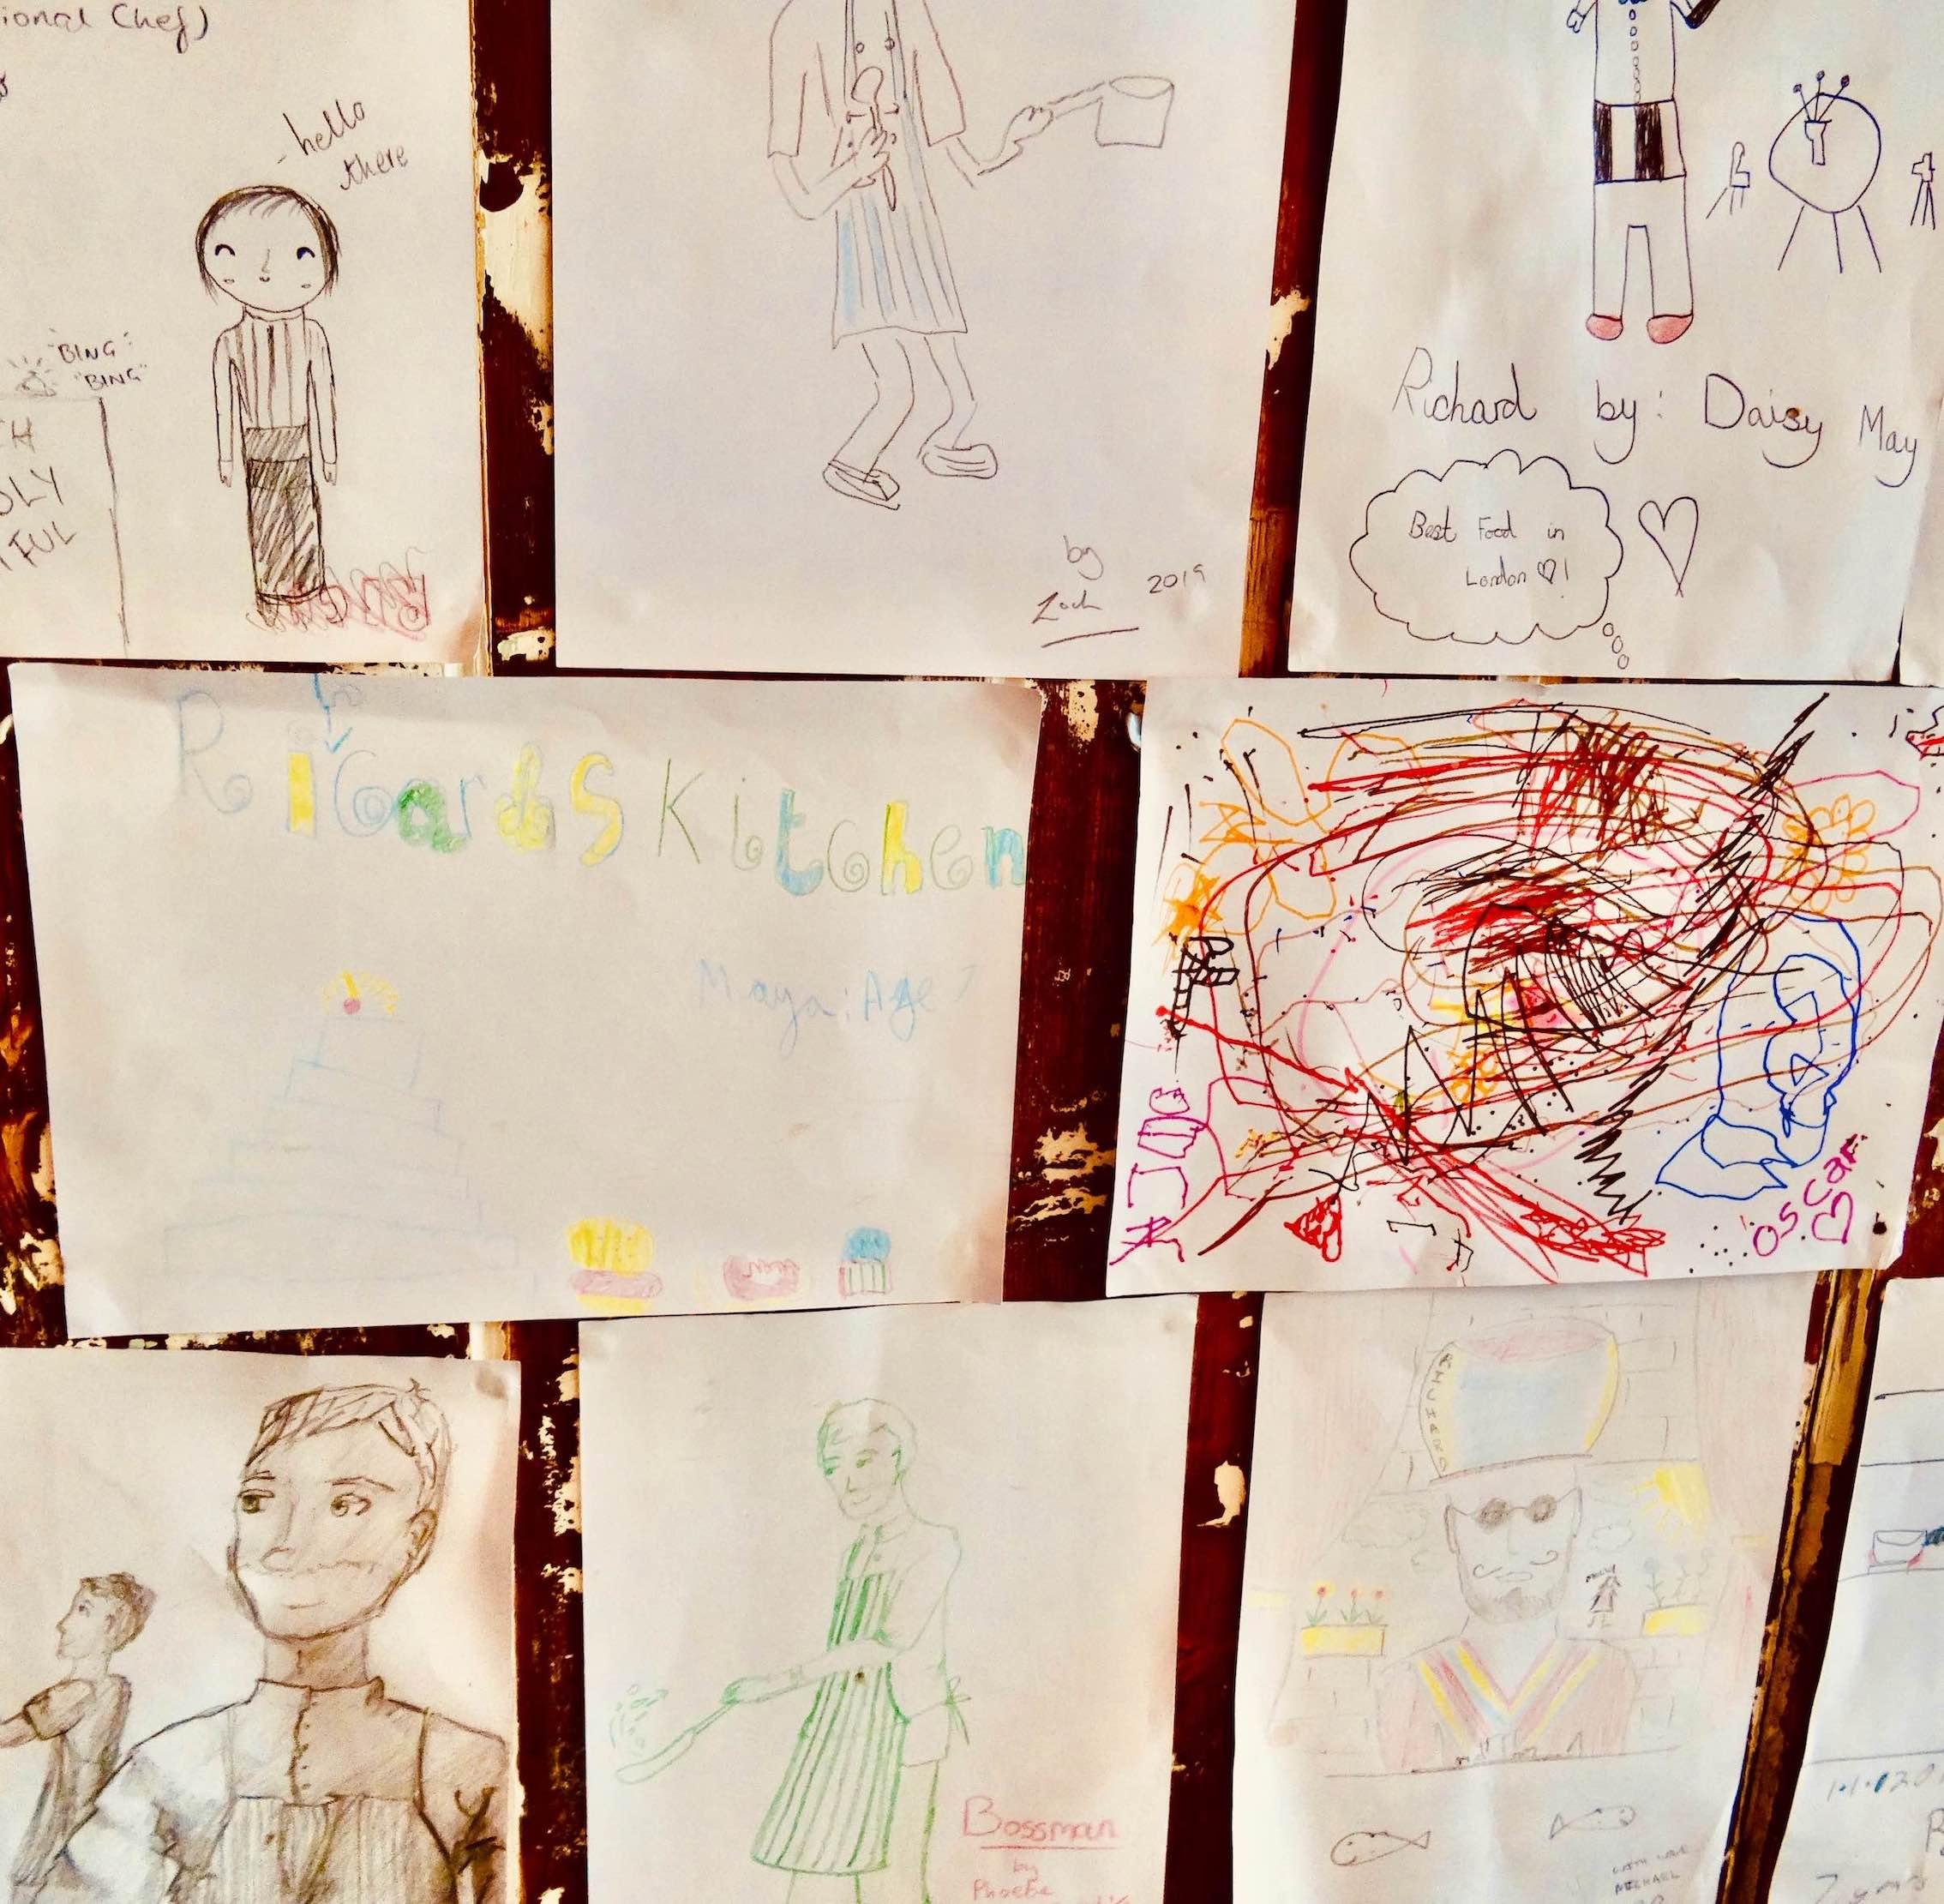 Children's artwork Richard's Kitchen London.